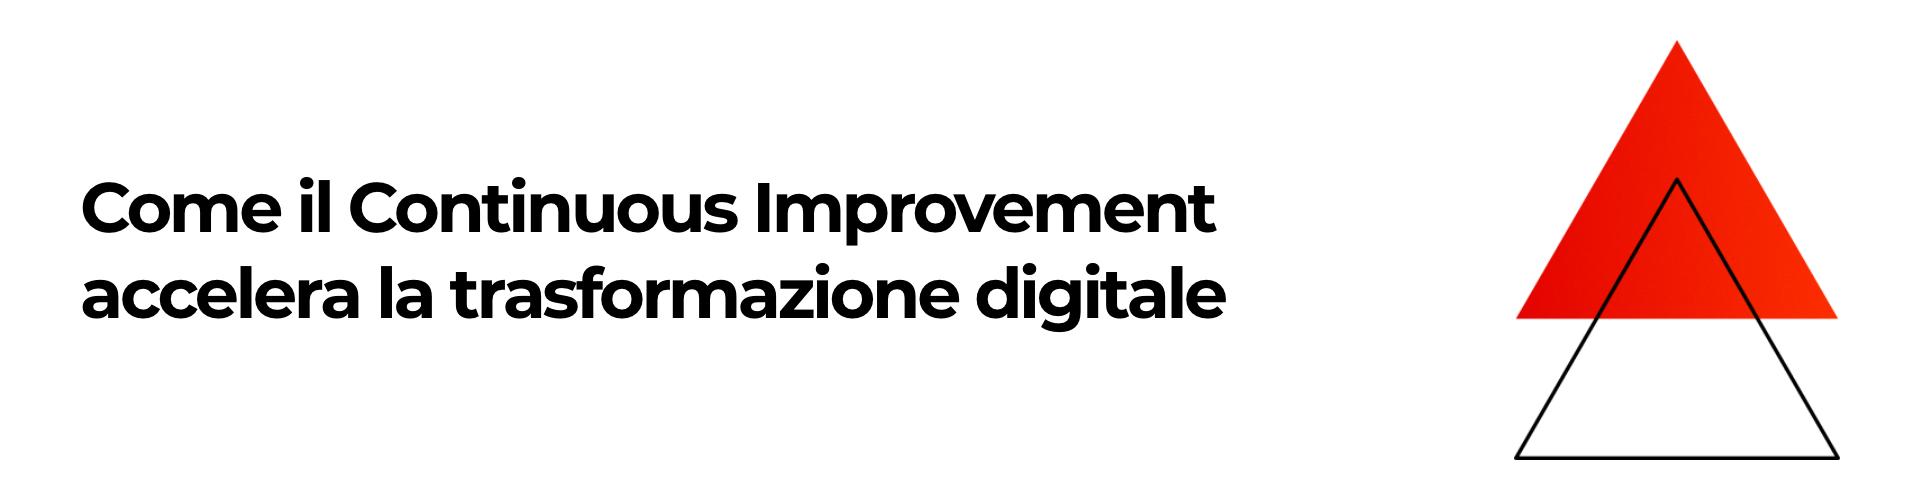 continuous_improvement_3